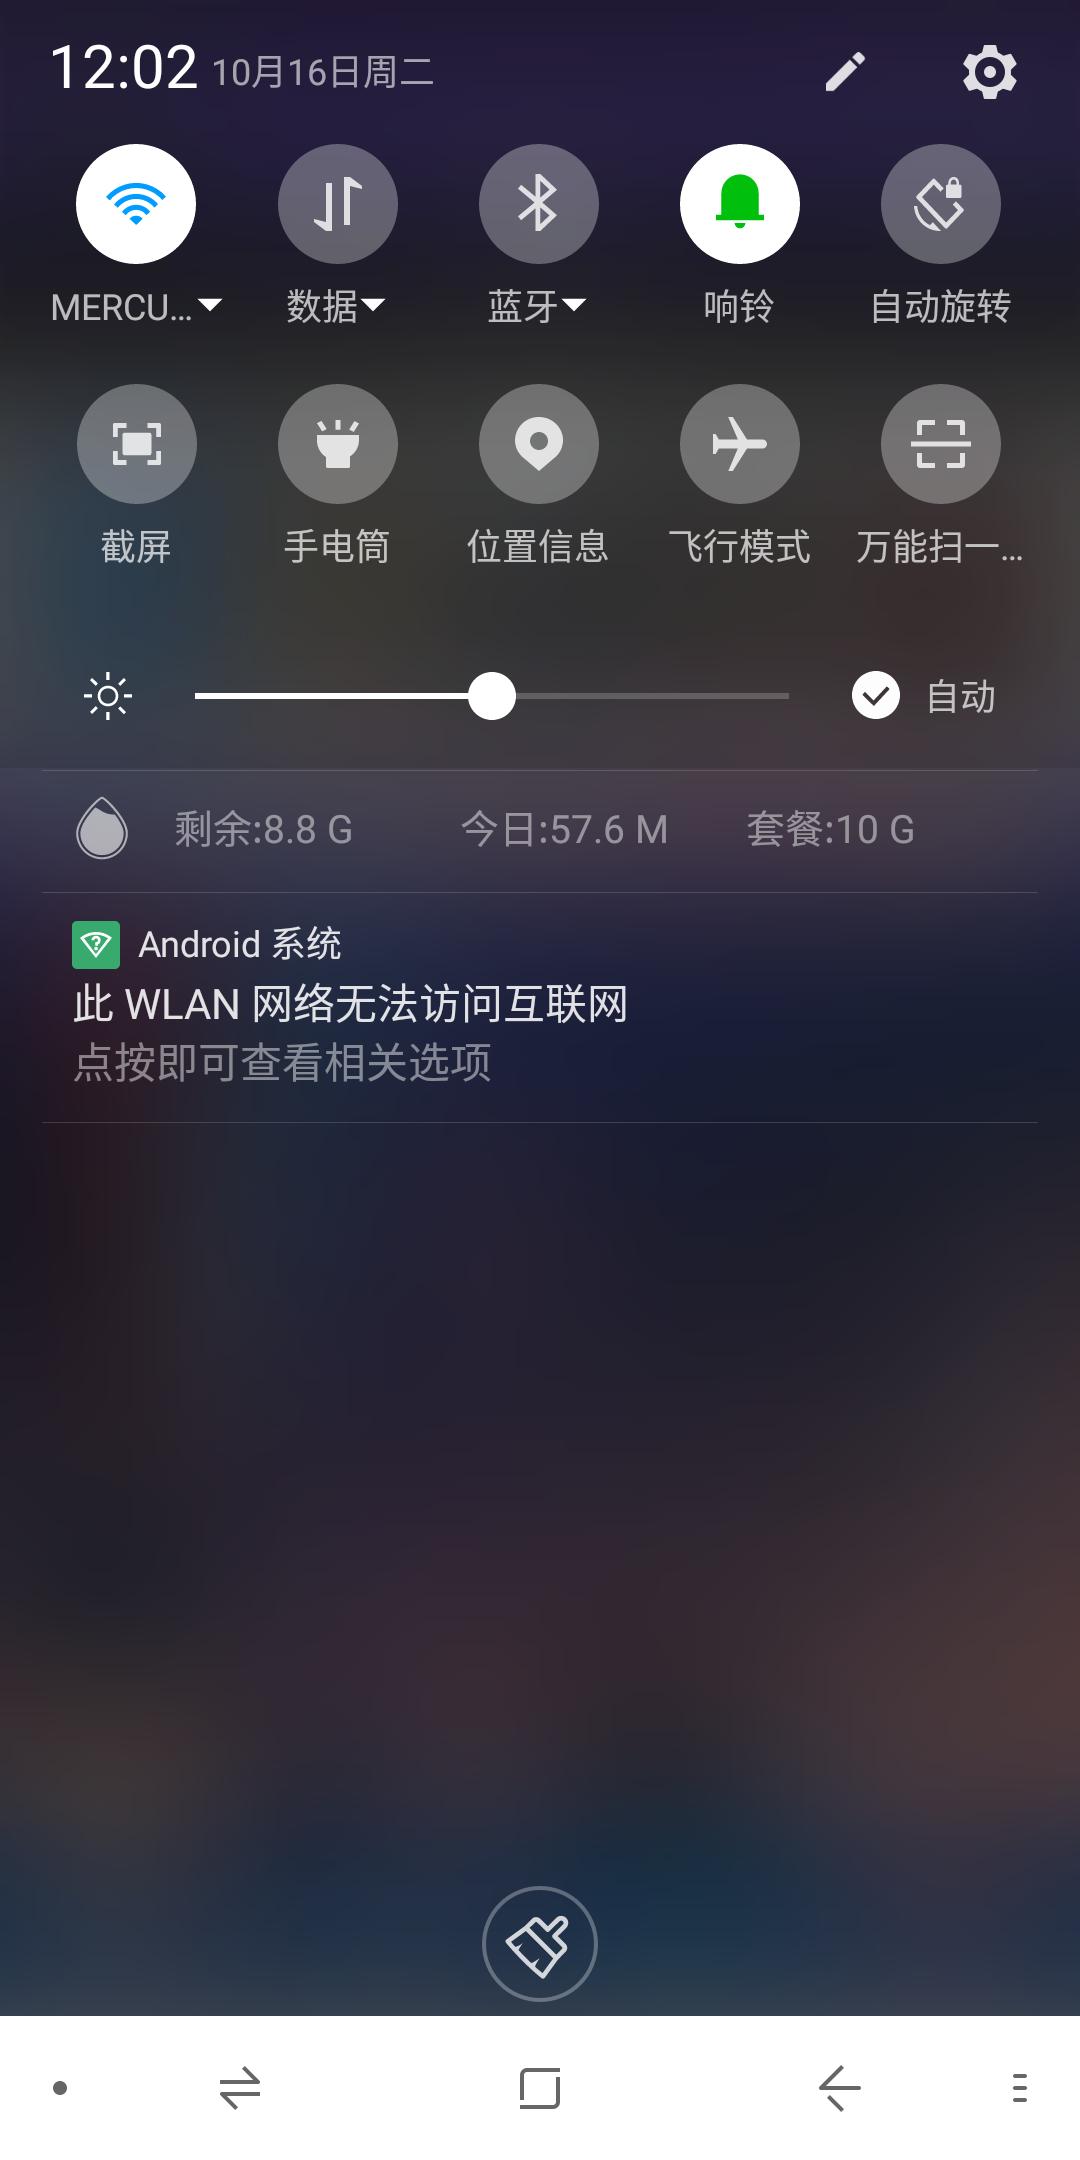 Screenshot_2018-10-16-12-02-39.png